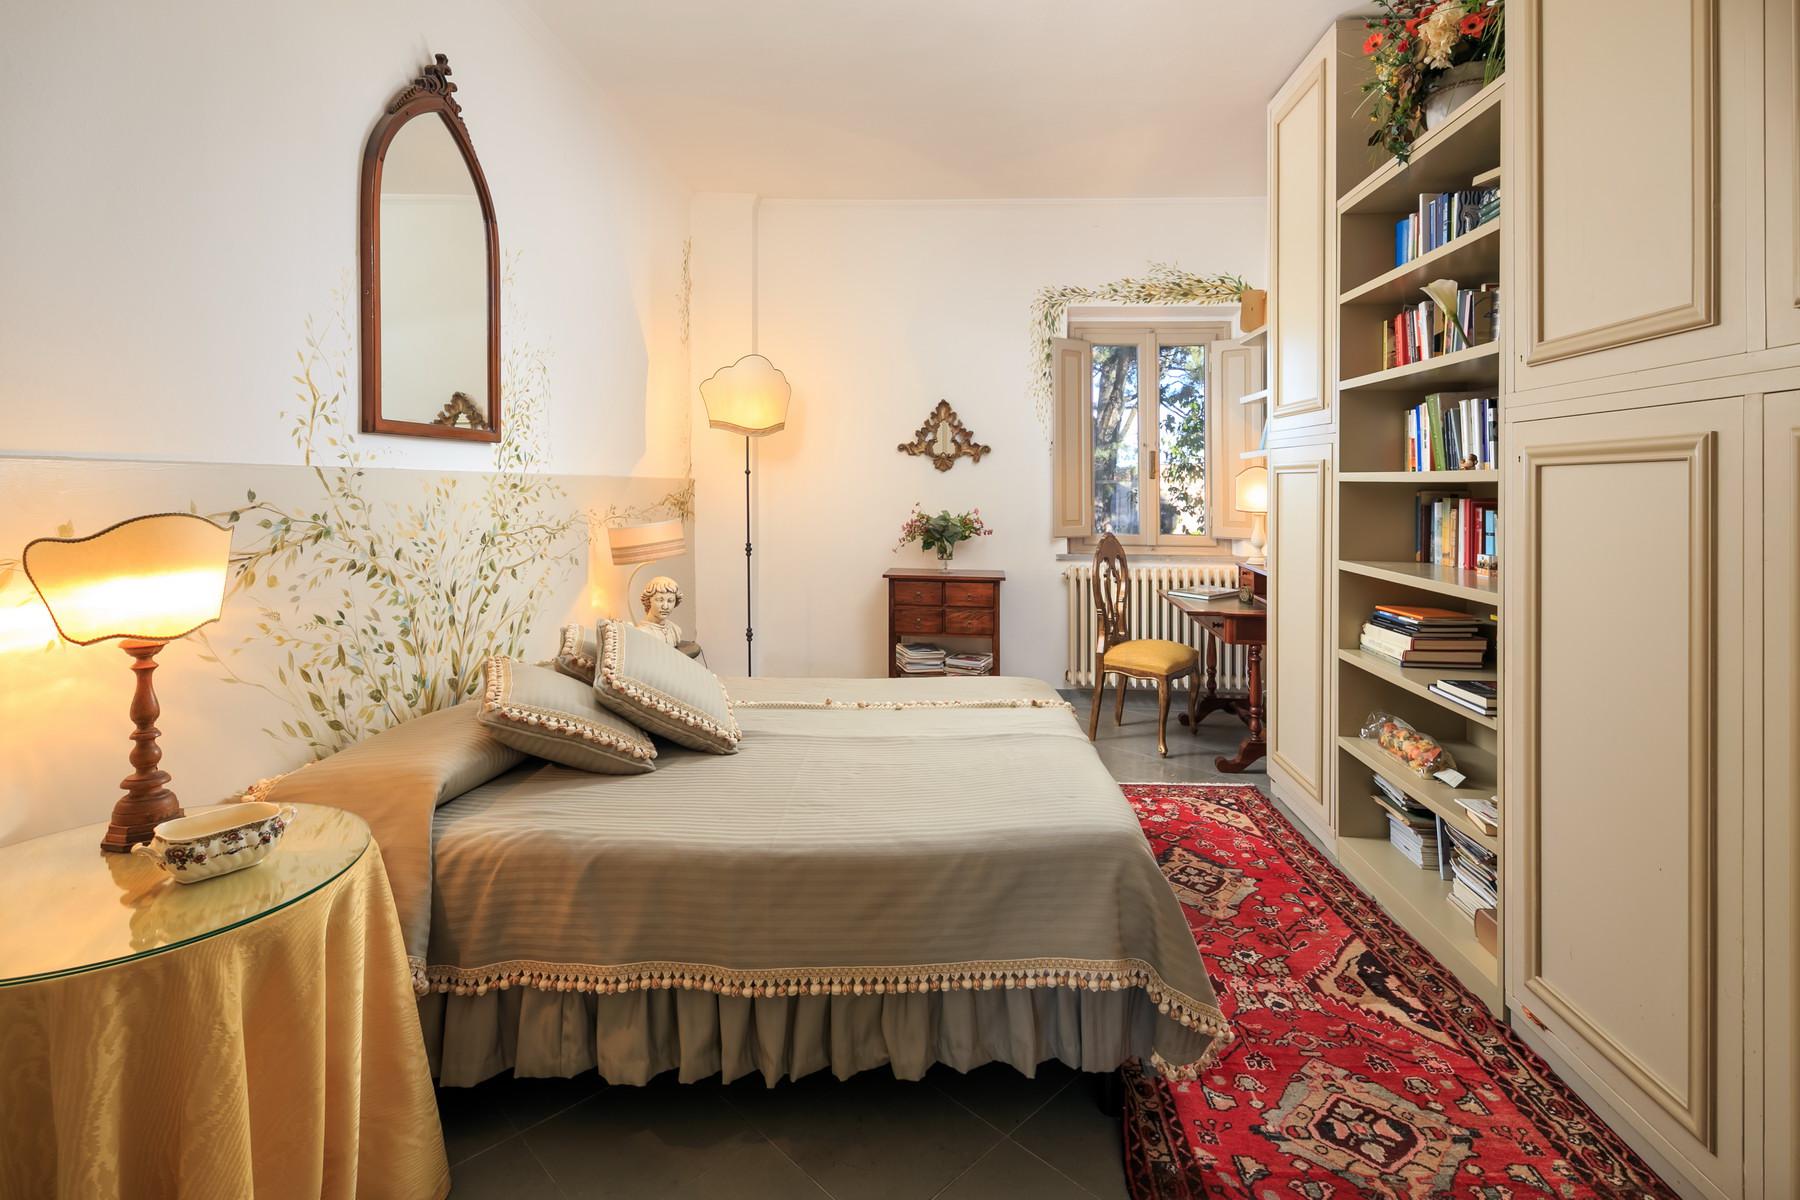 Villa in Vendita a Casciana Terme Lari: 5 locali, 550 mq - Foto 10